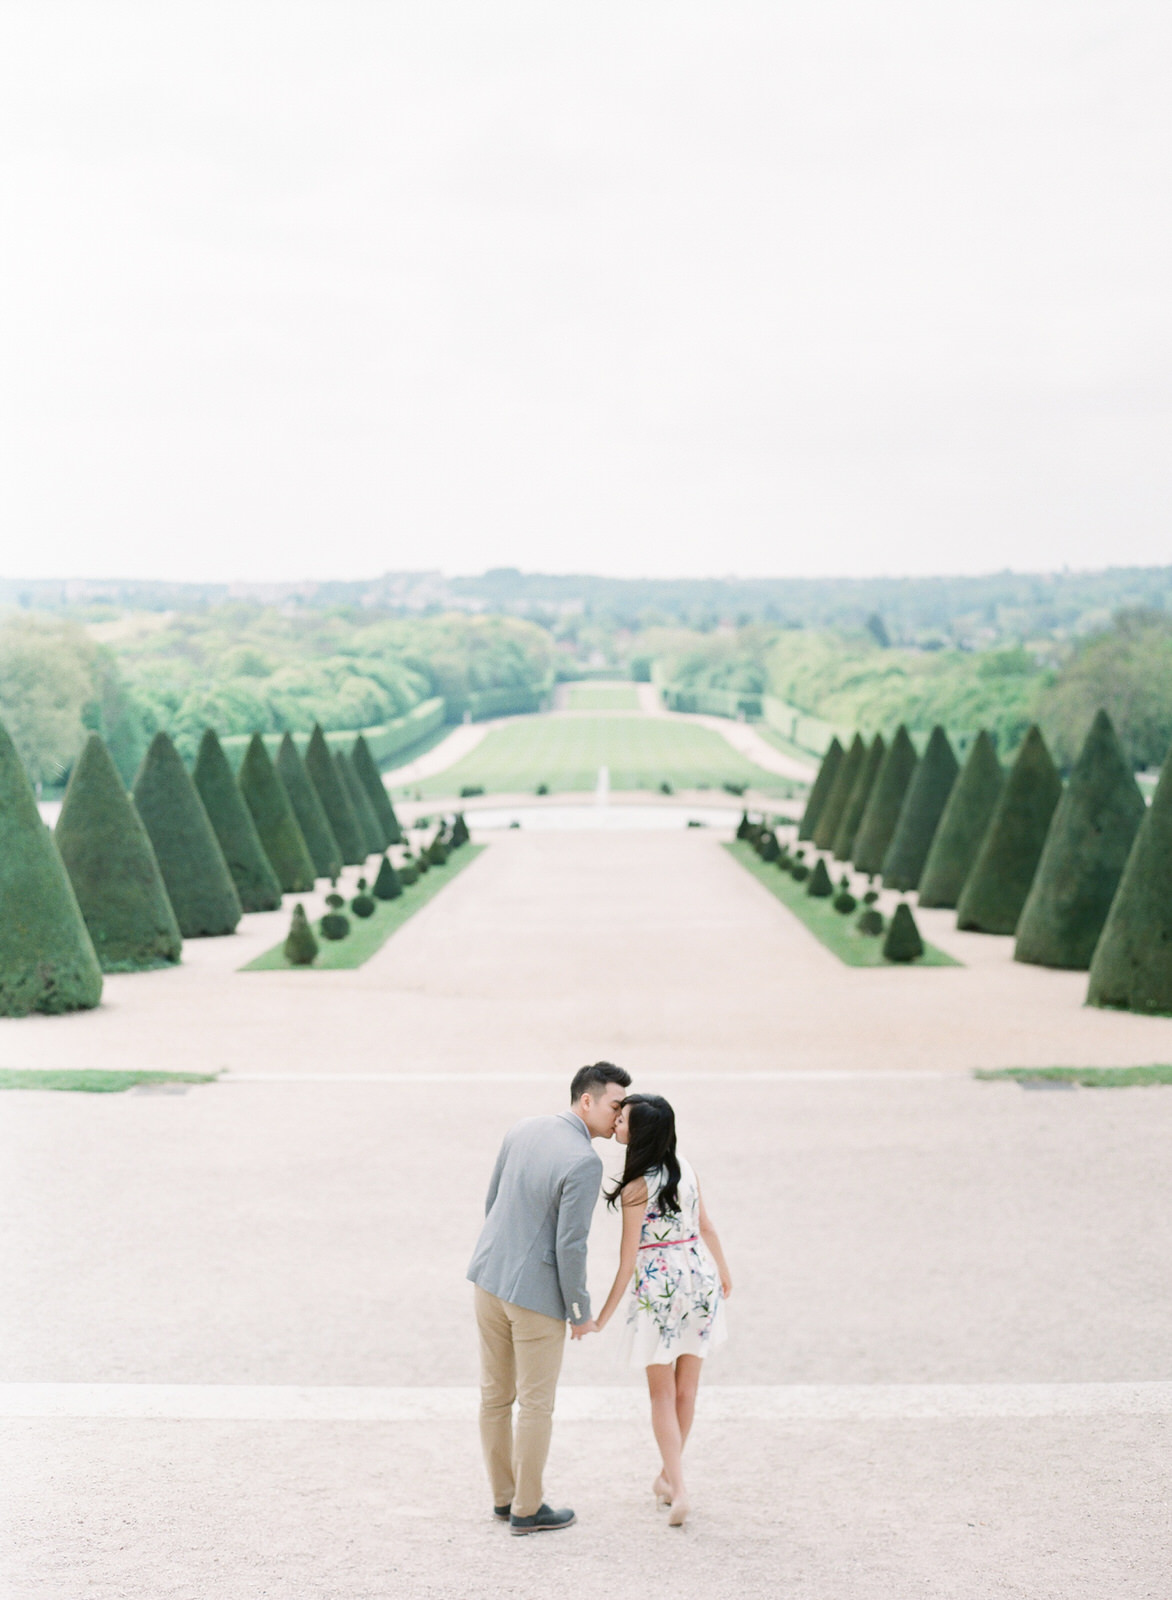 Paris Destination Pre-Wedding   Veronica & Wilson   photo by: AR